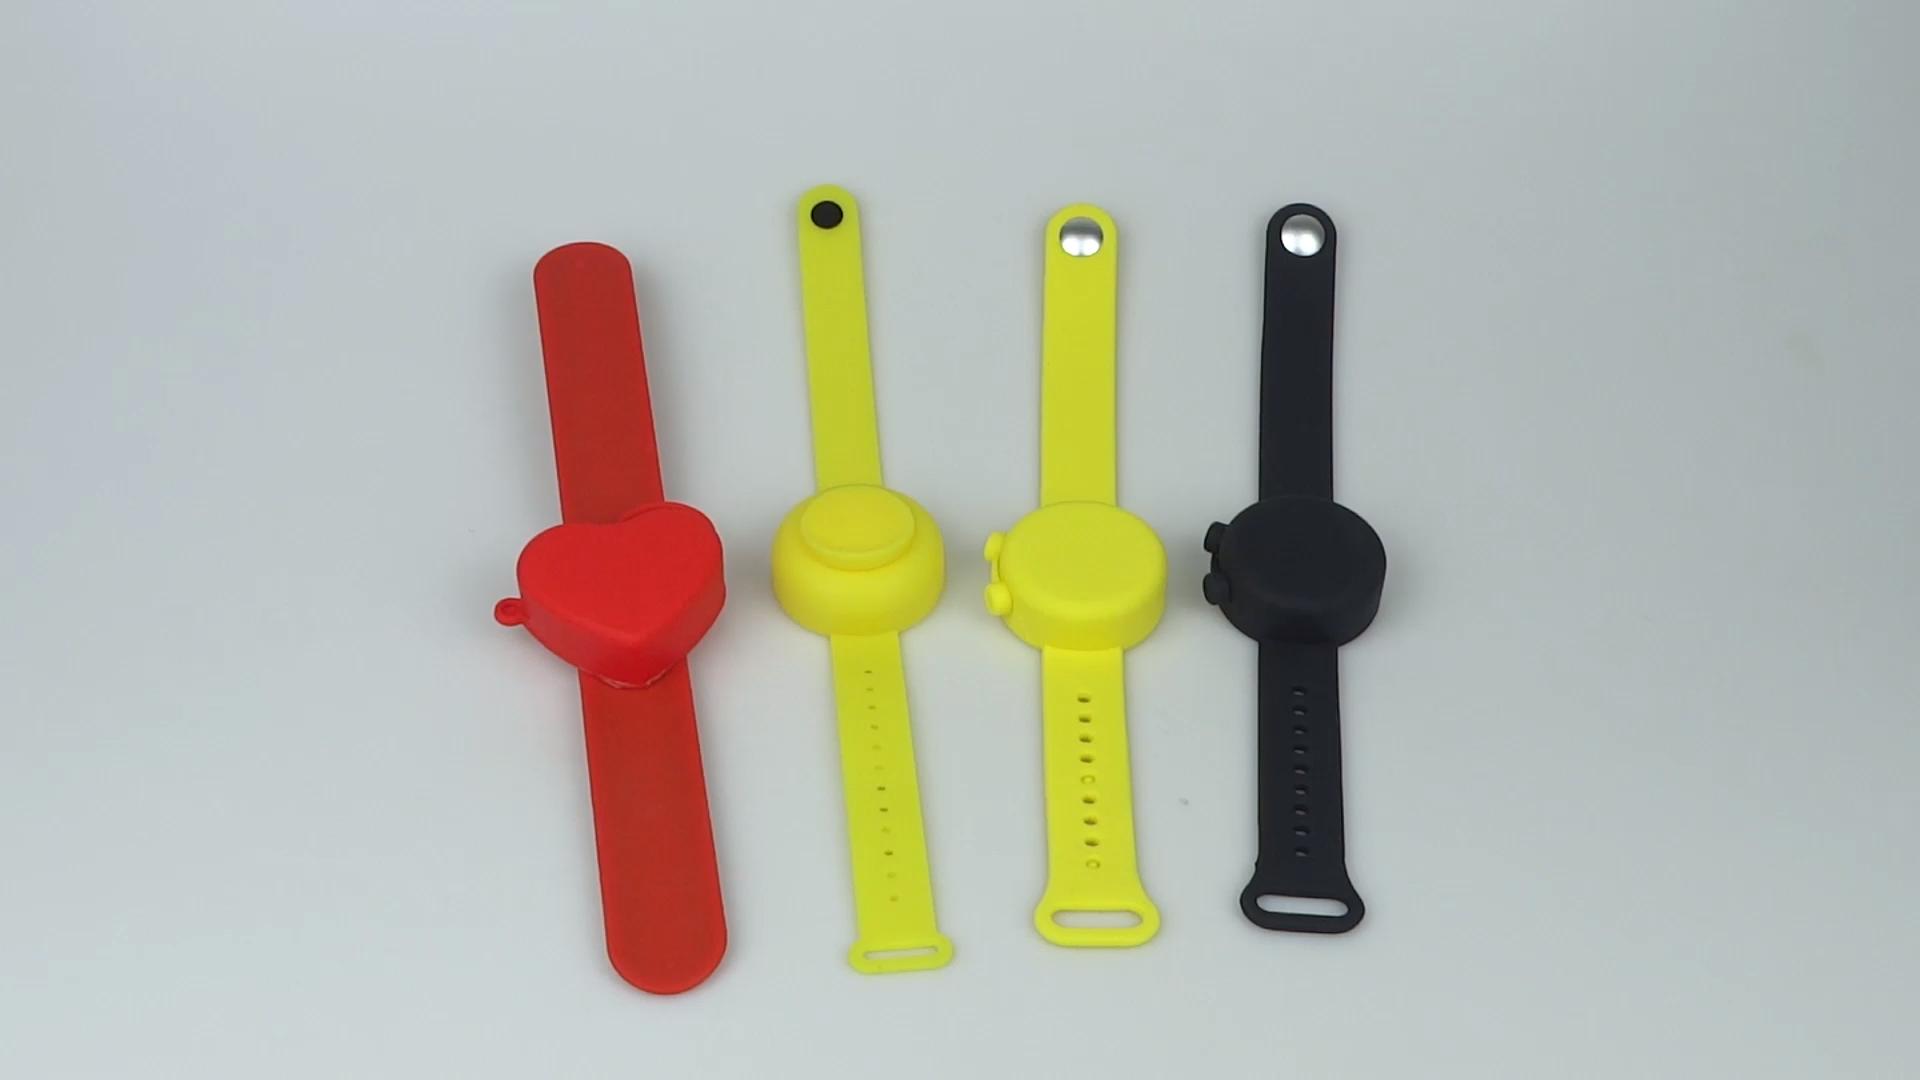 Children Hand Sanitizer Bracelet Portable Soap Dispenser Reloj Desinfectante De Manos Refill Sanitation Wrist Band